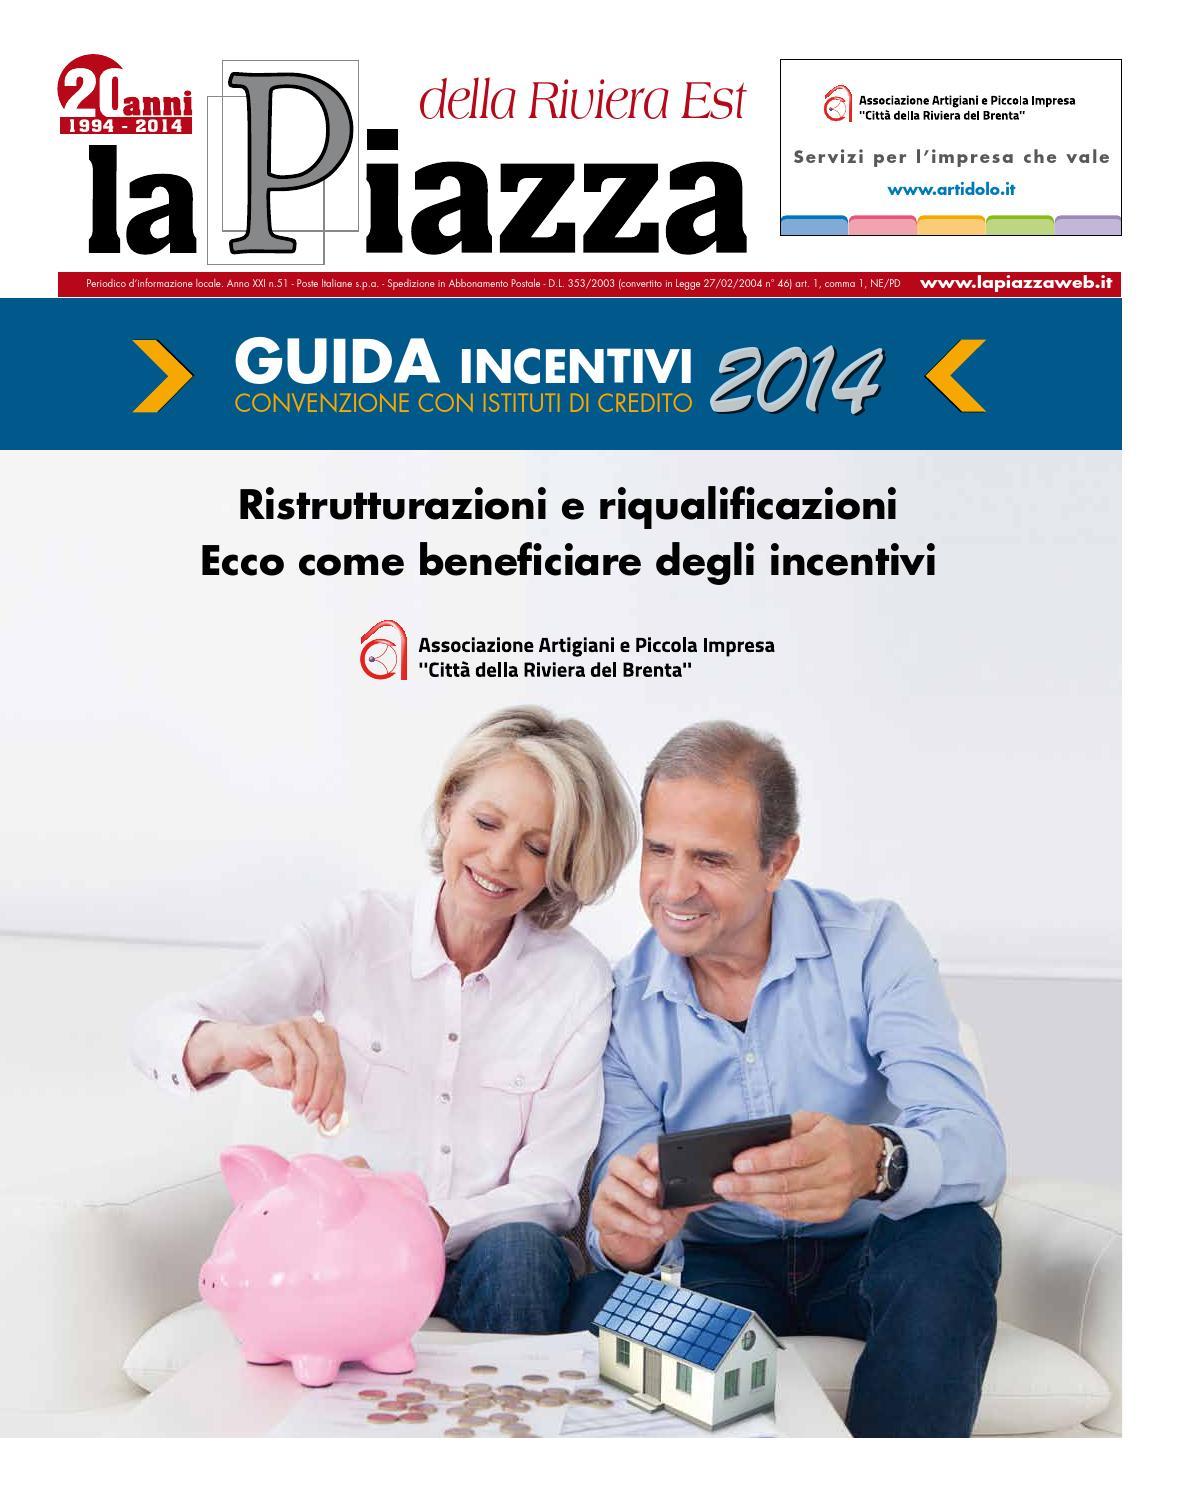 La Piazza Della Riviera Est Apr2014 N51 By Lapiazza Give Emotions